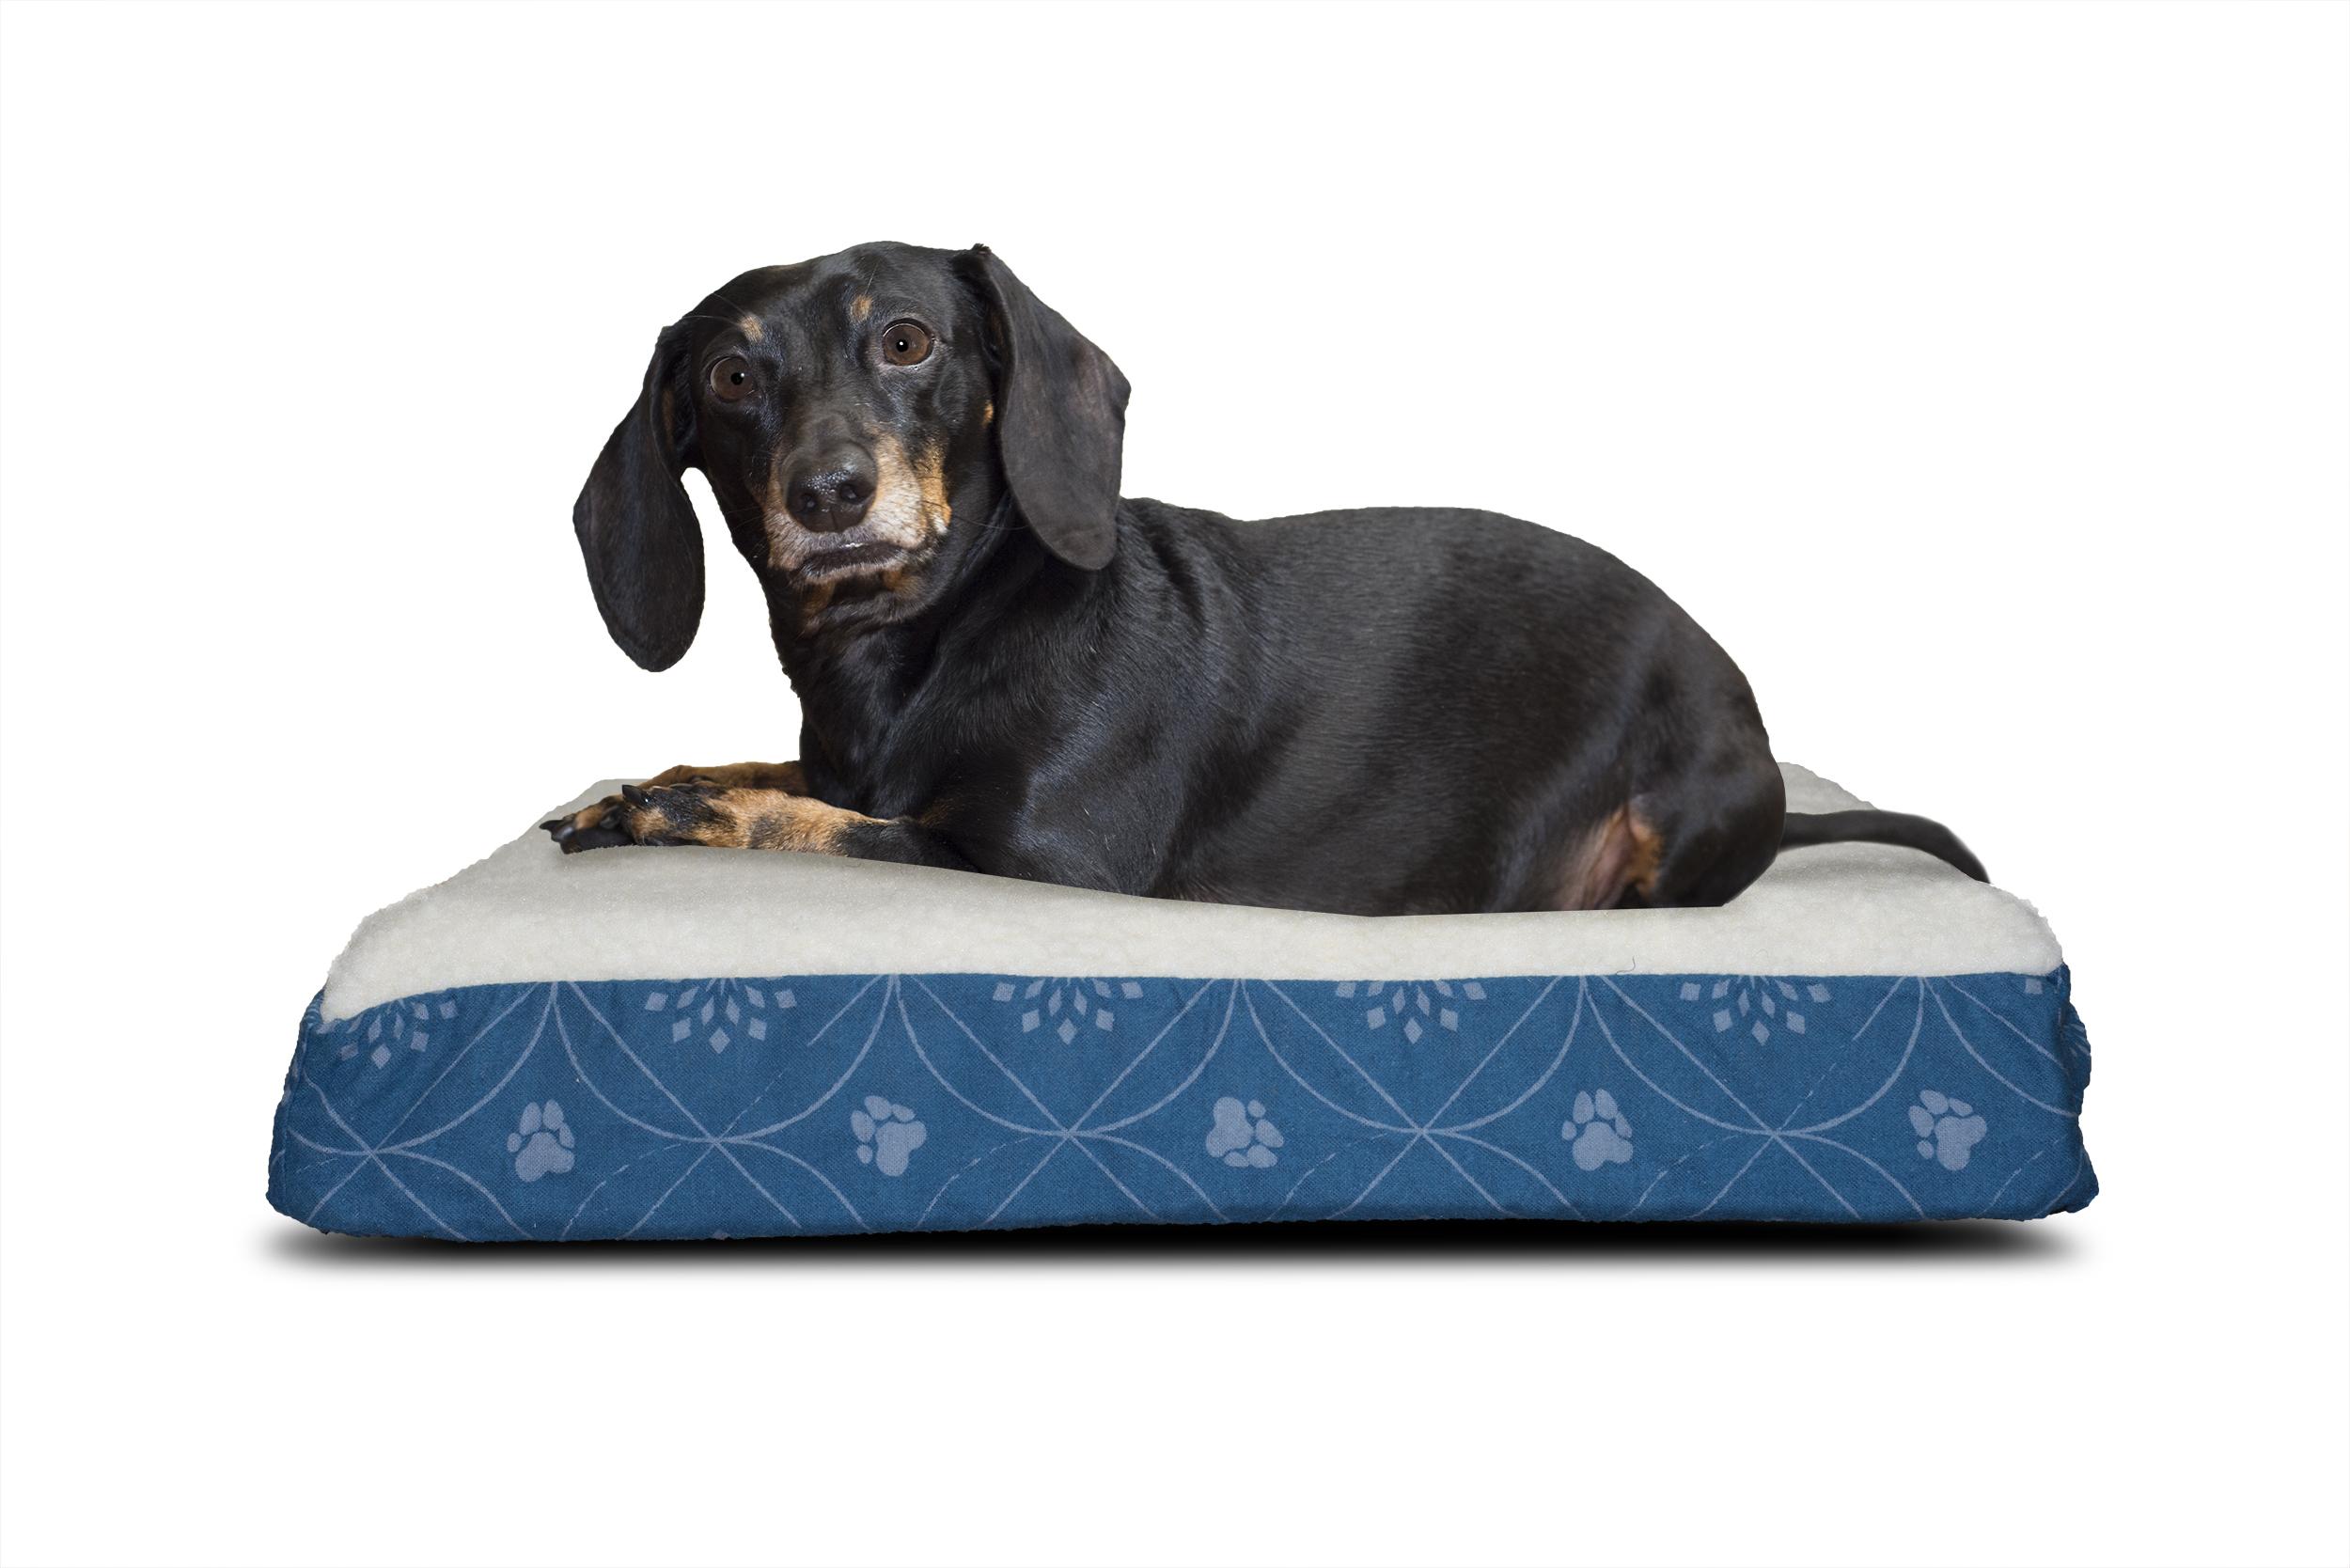 furhaven nap pet bed deluxe flannel egg-crate orthopedic mat pet